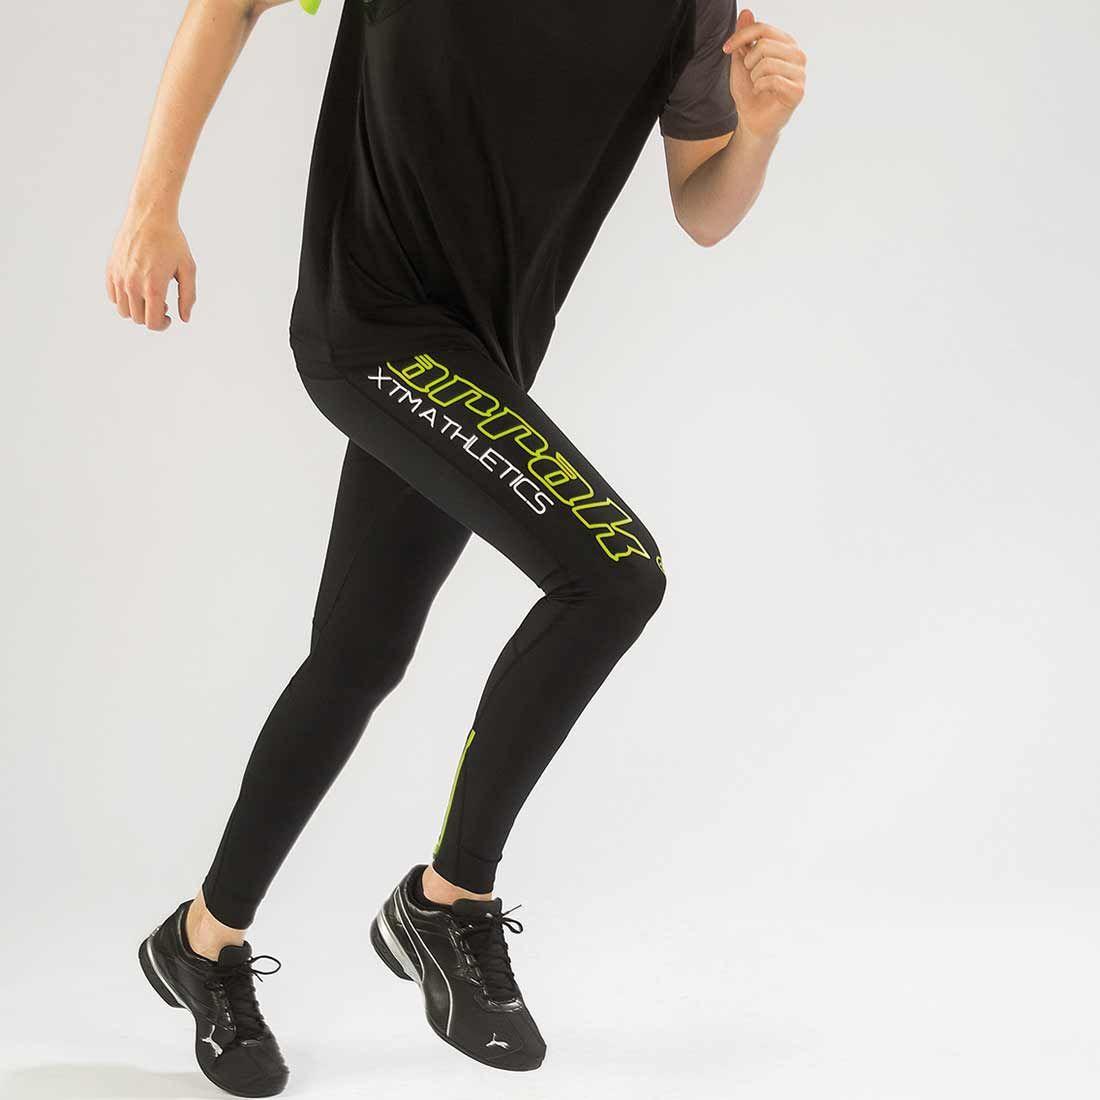 Arrak Athletics tights  Black/Green 4XL